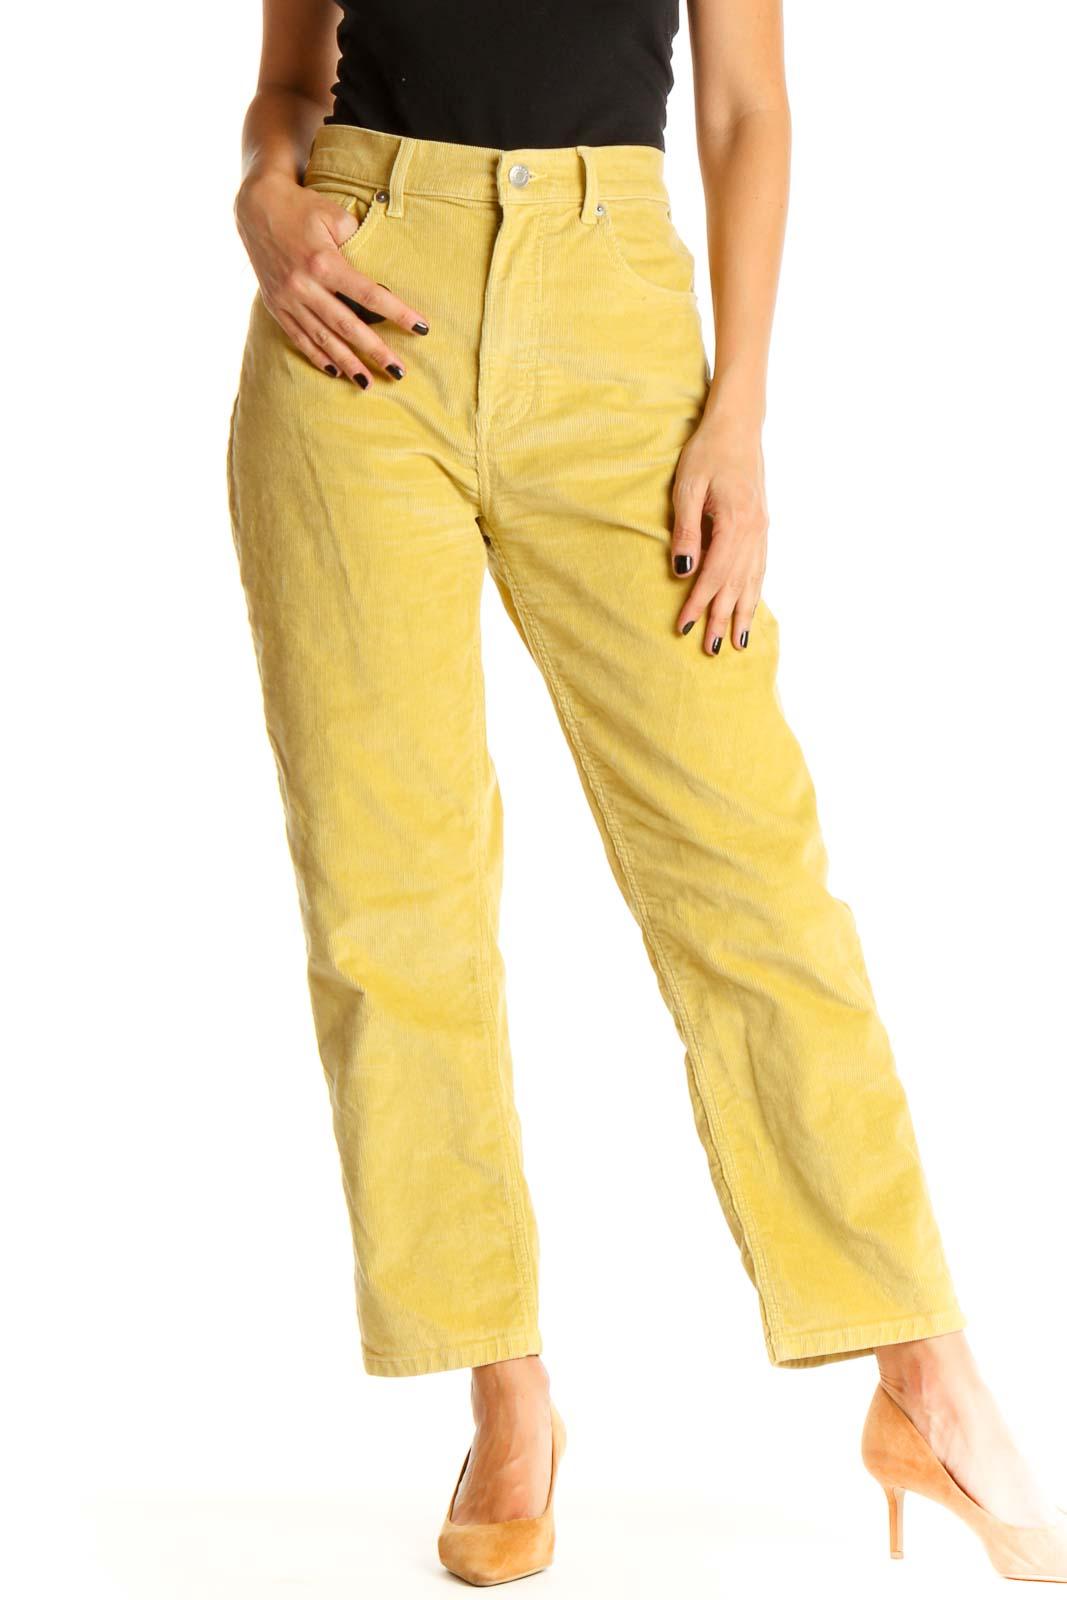 Yellow Brunch Pants Front